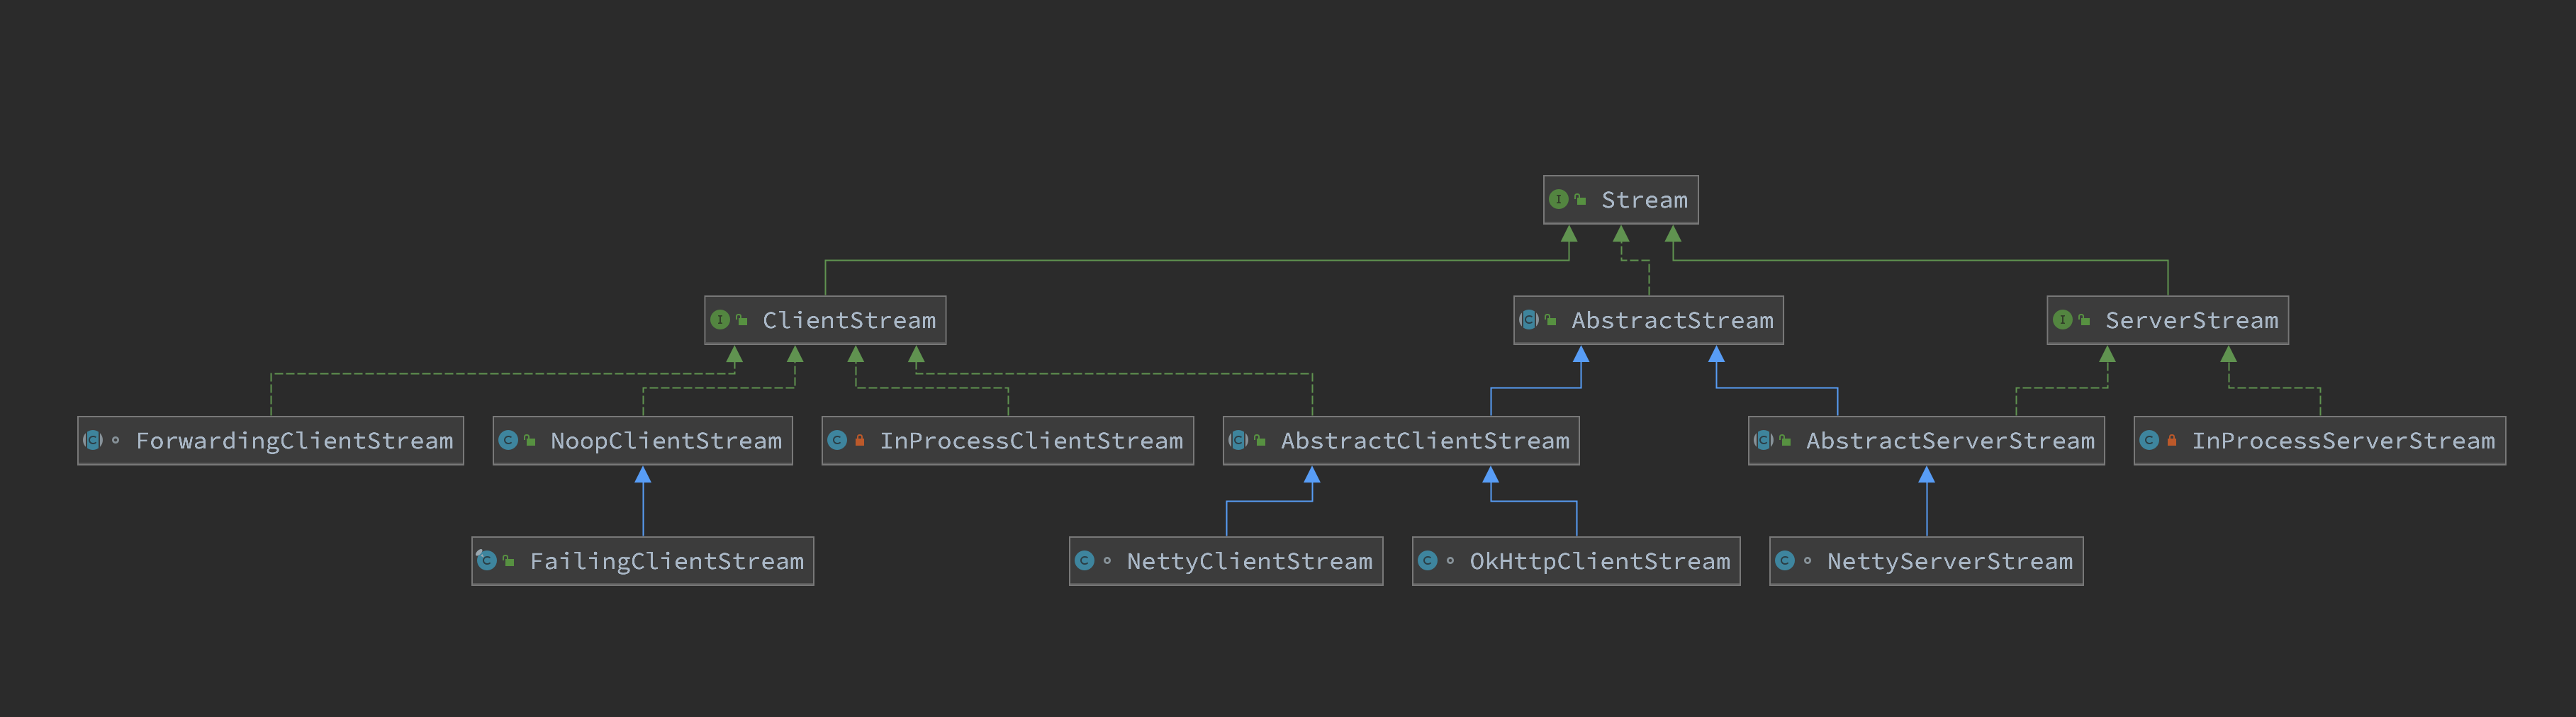 grpc-source-code-stream-diagram.png